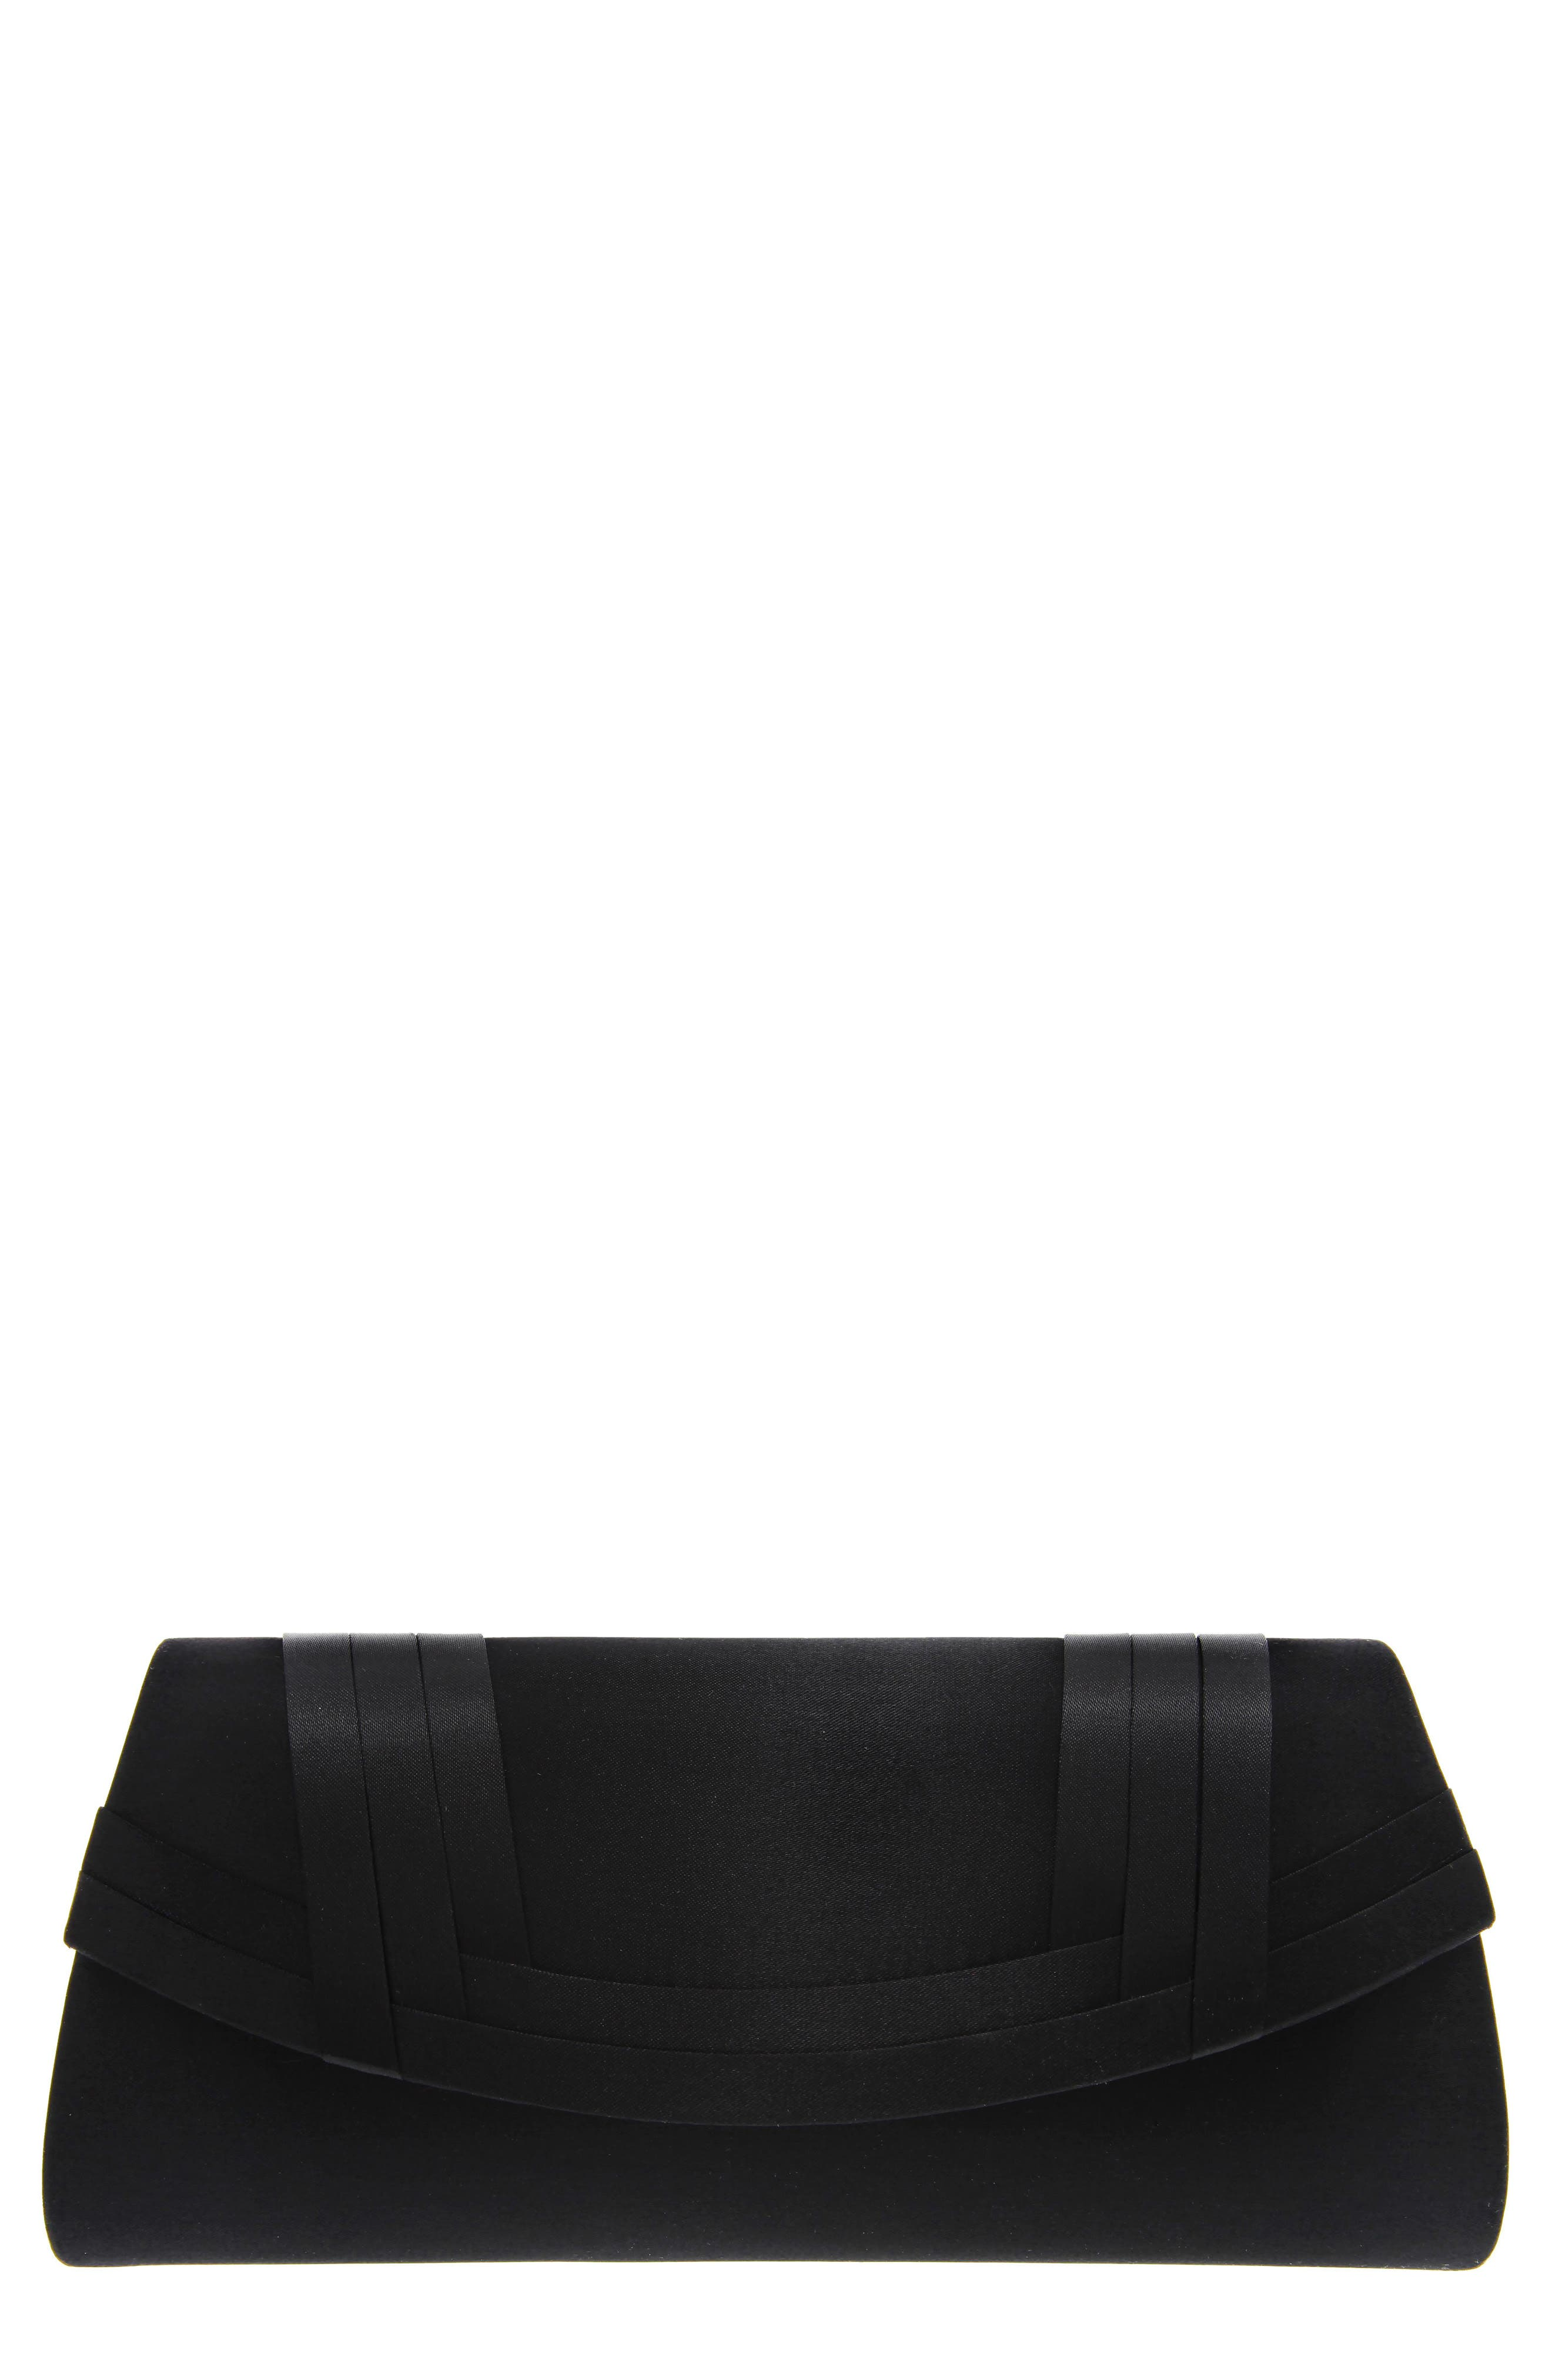 NINA Avis Pleated Classic Clutch, Main, color, BLACK NOBLE SATIN